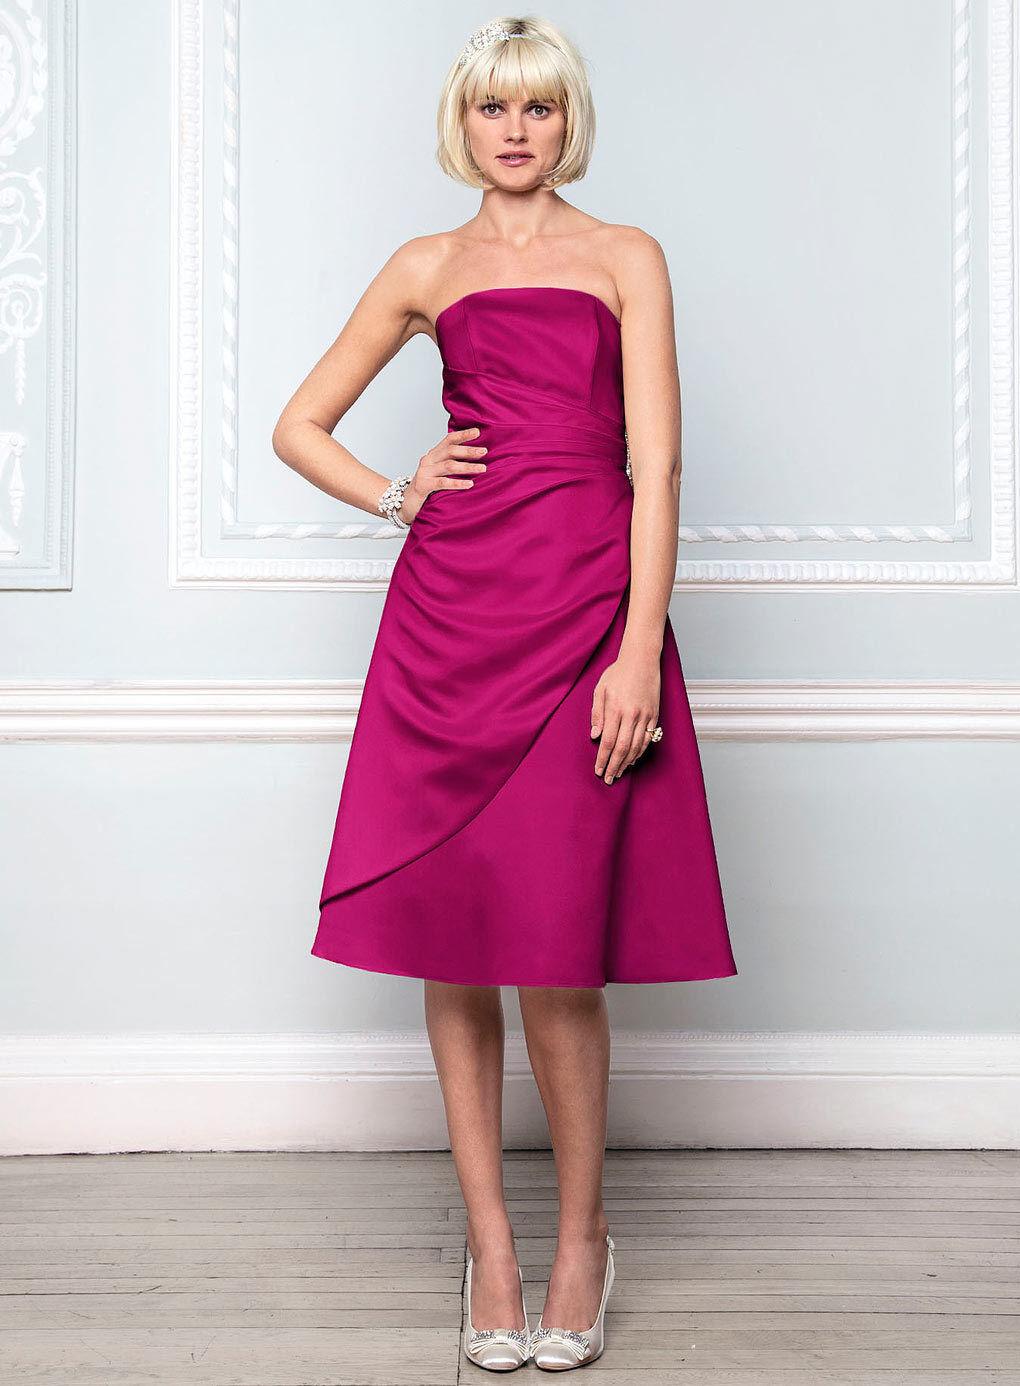 Vestido de dama dama dama de honor BNWT Talla 12 16 18 BHS Eve corto rosado Fucsia Satén d2a082